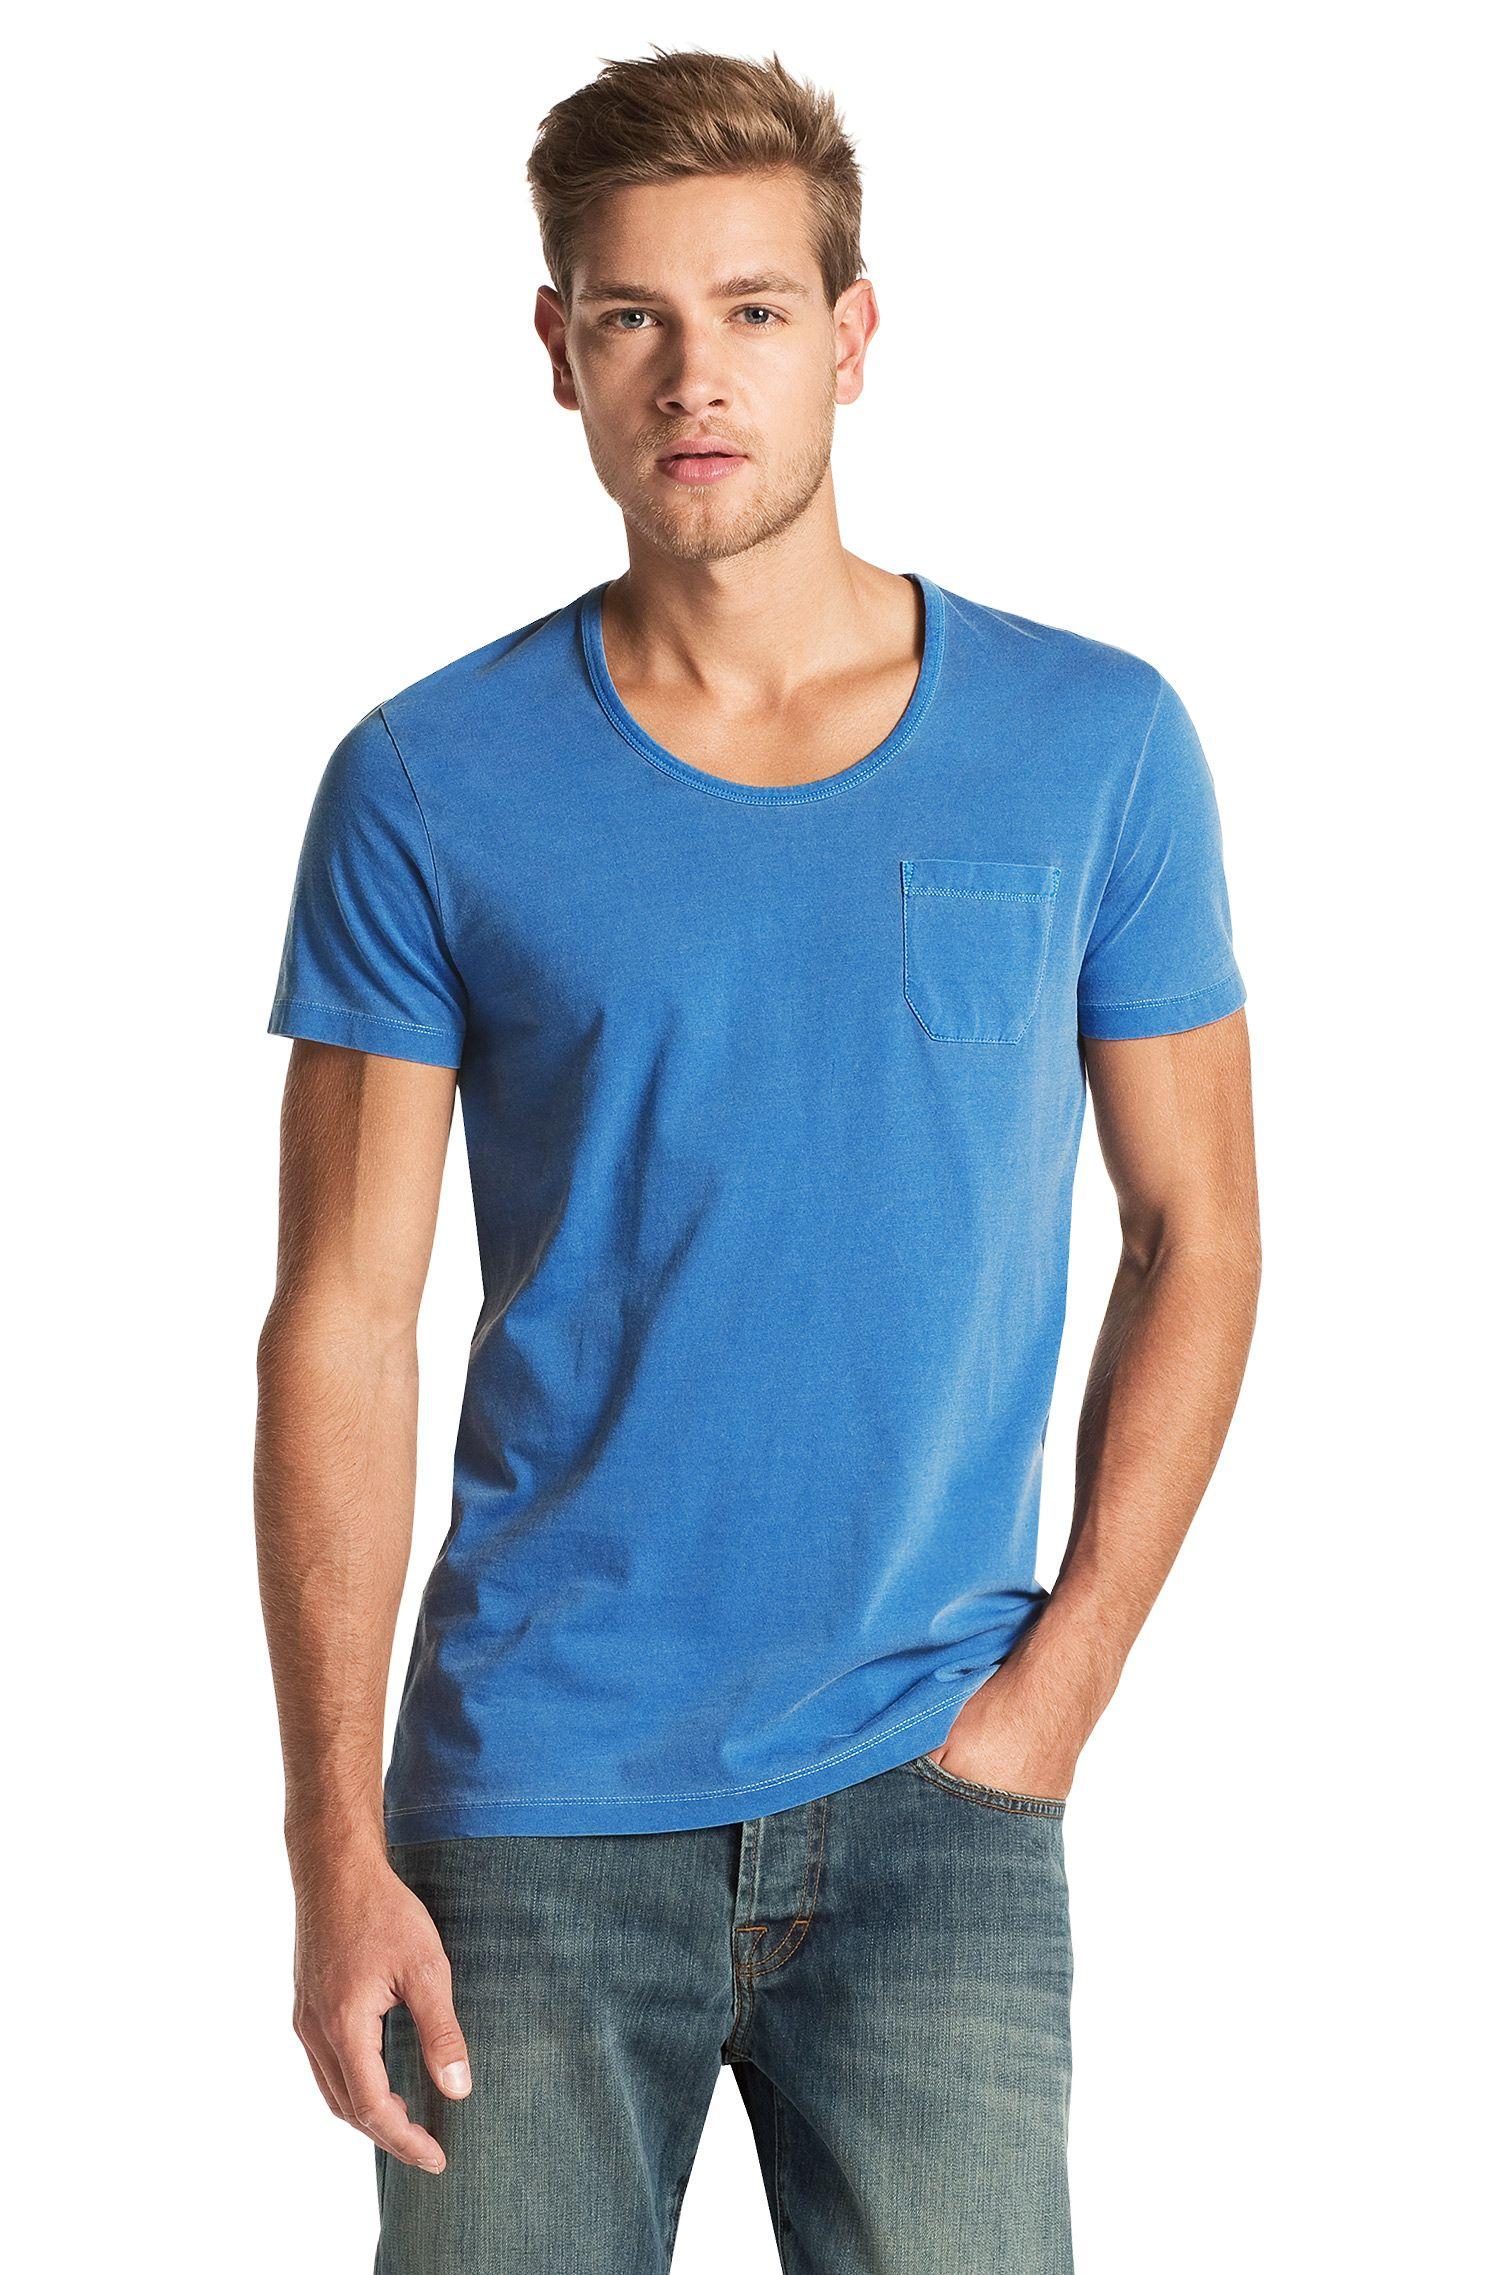 T-Shirt ´Taxes` mit Rundhals-Ausschnitt